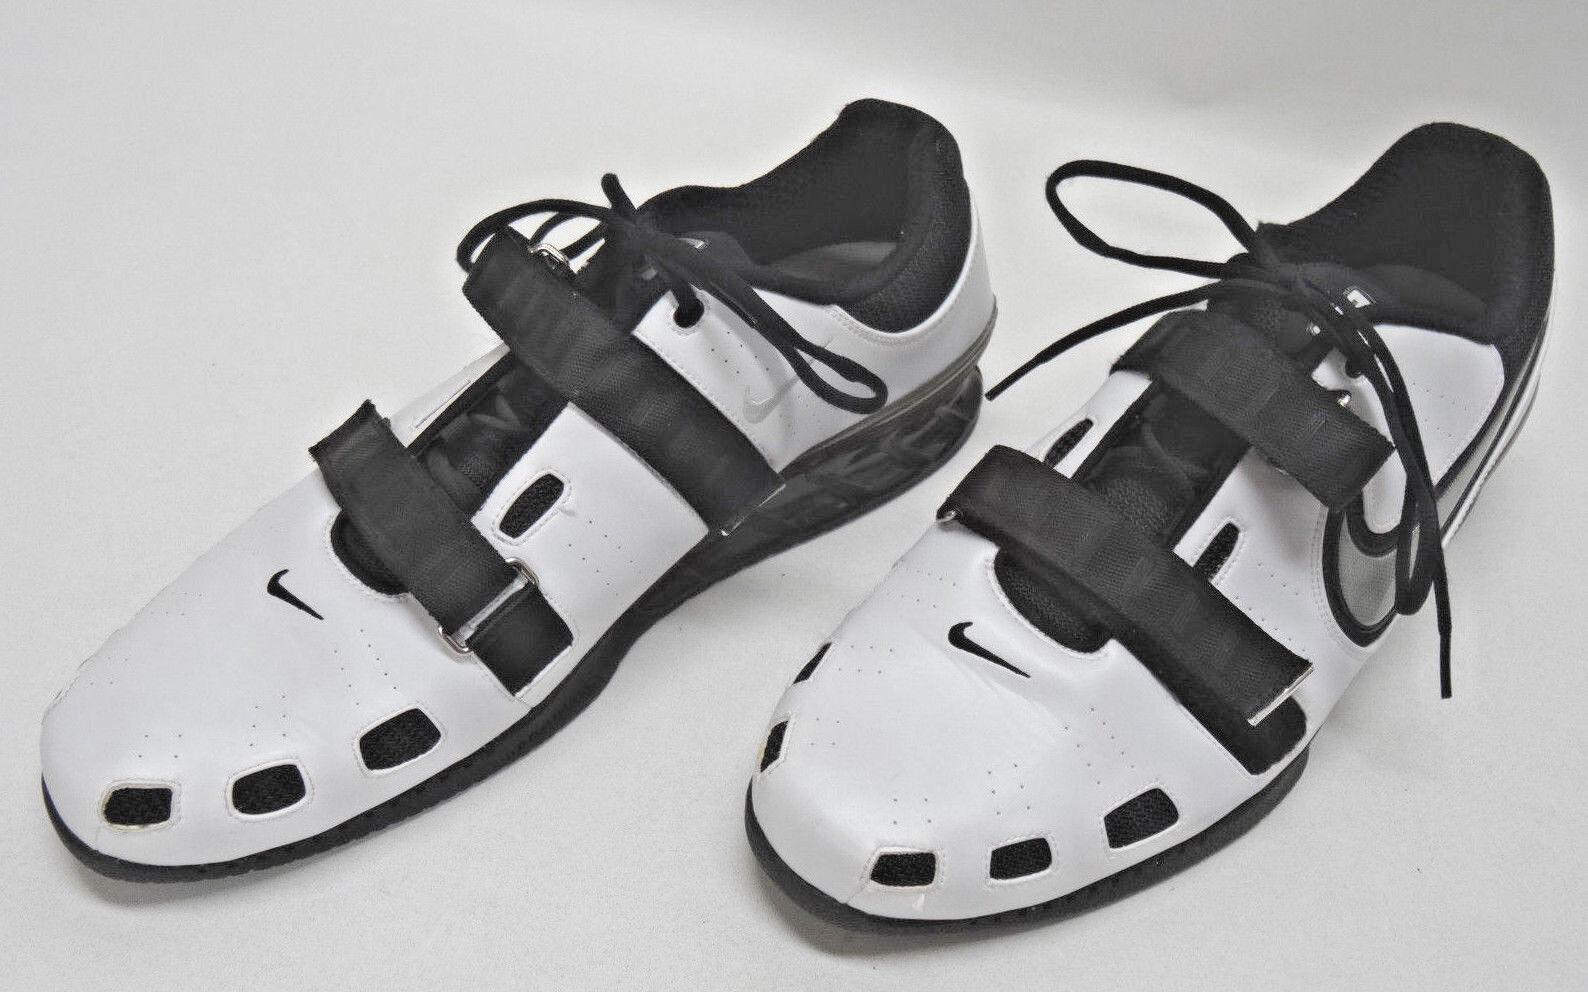 Nike romaleos sollevamento pesi scarpe nero / bianco 17uk Uomo dimensioni 18us / 17uk bianco / 52.5euc 0a54ef